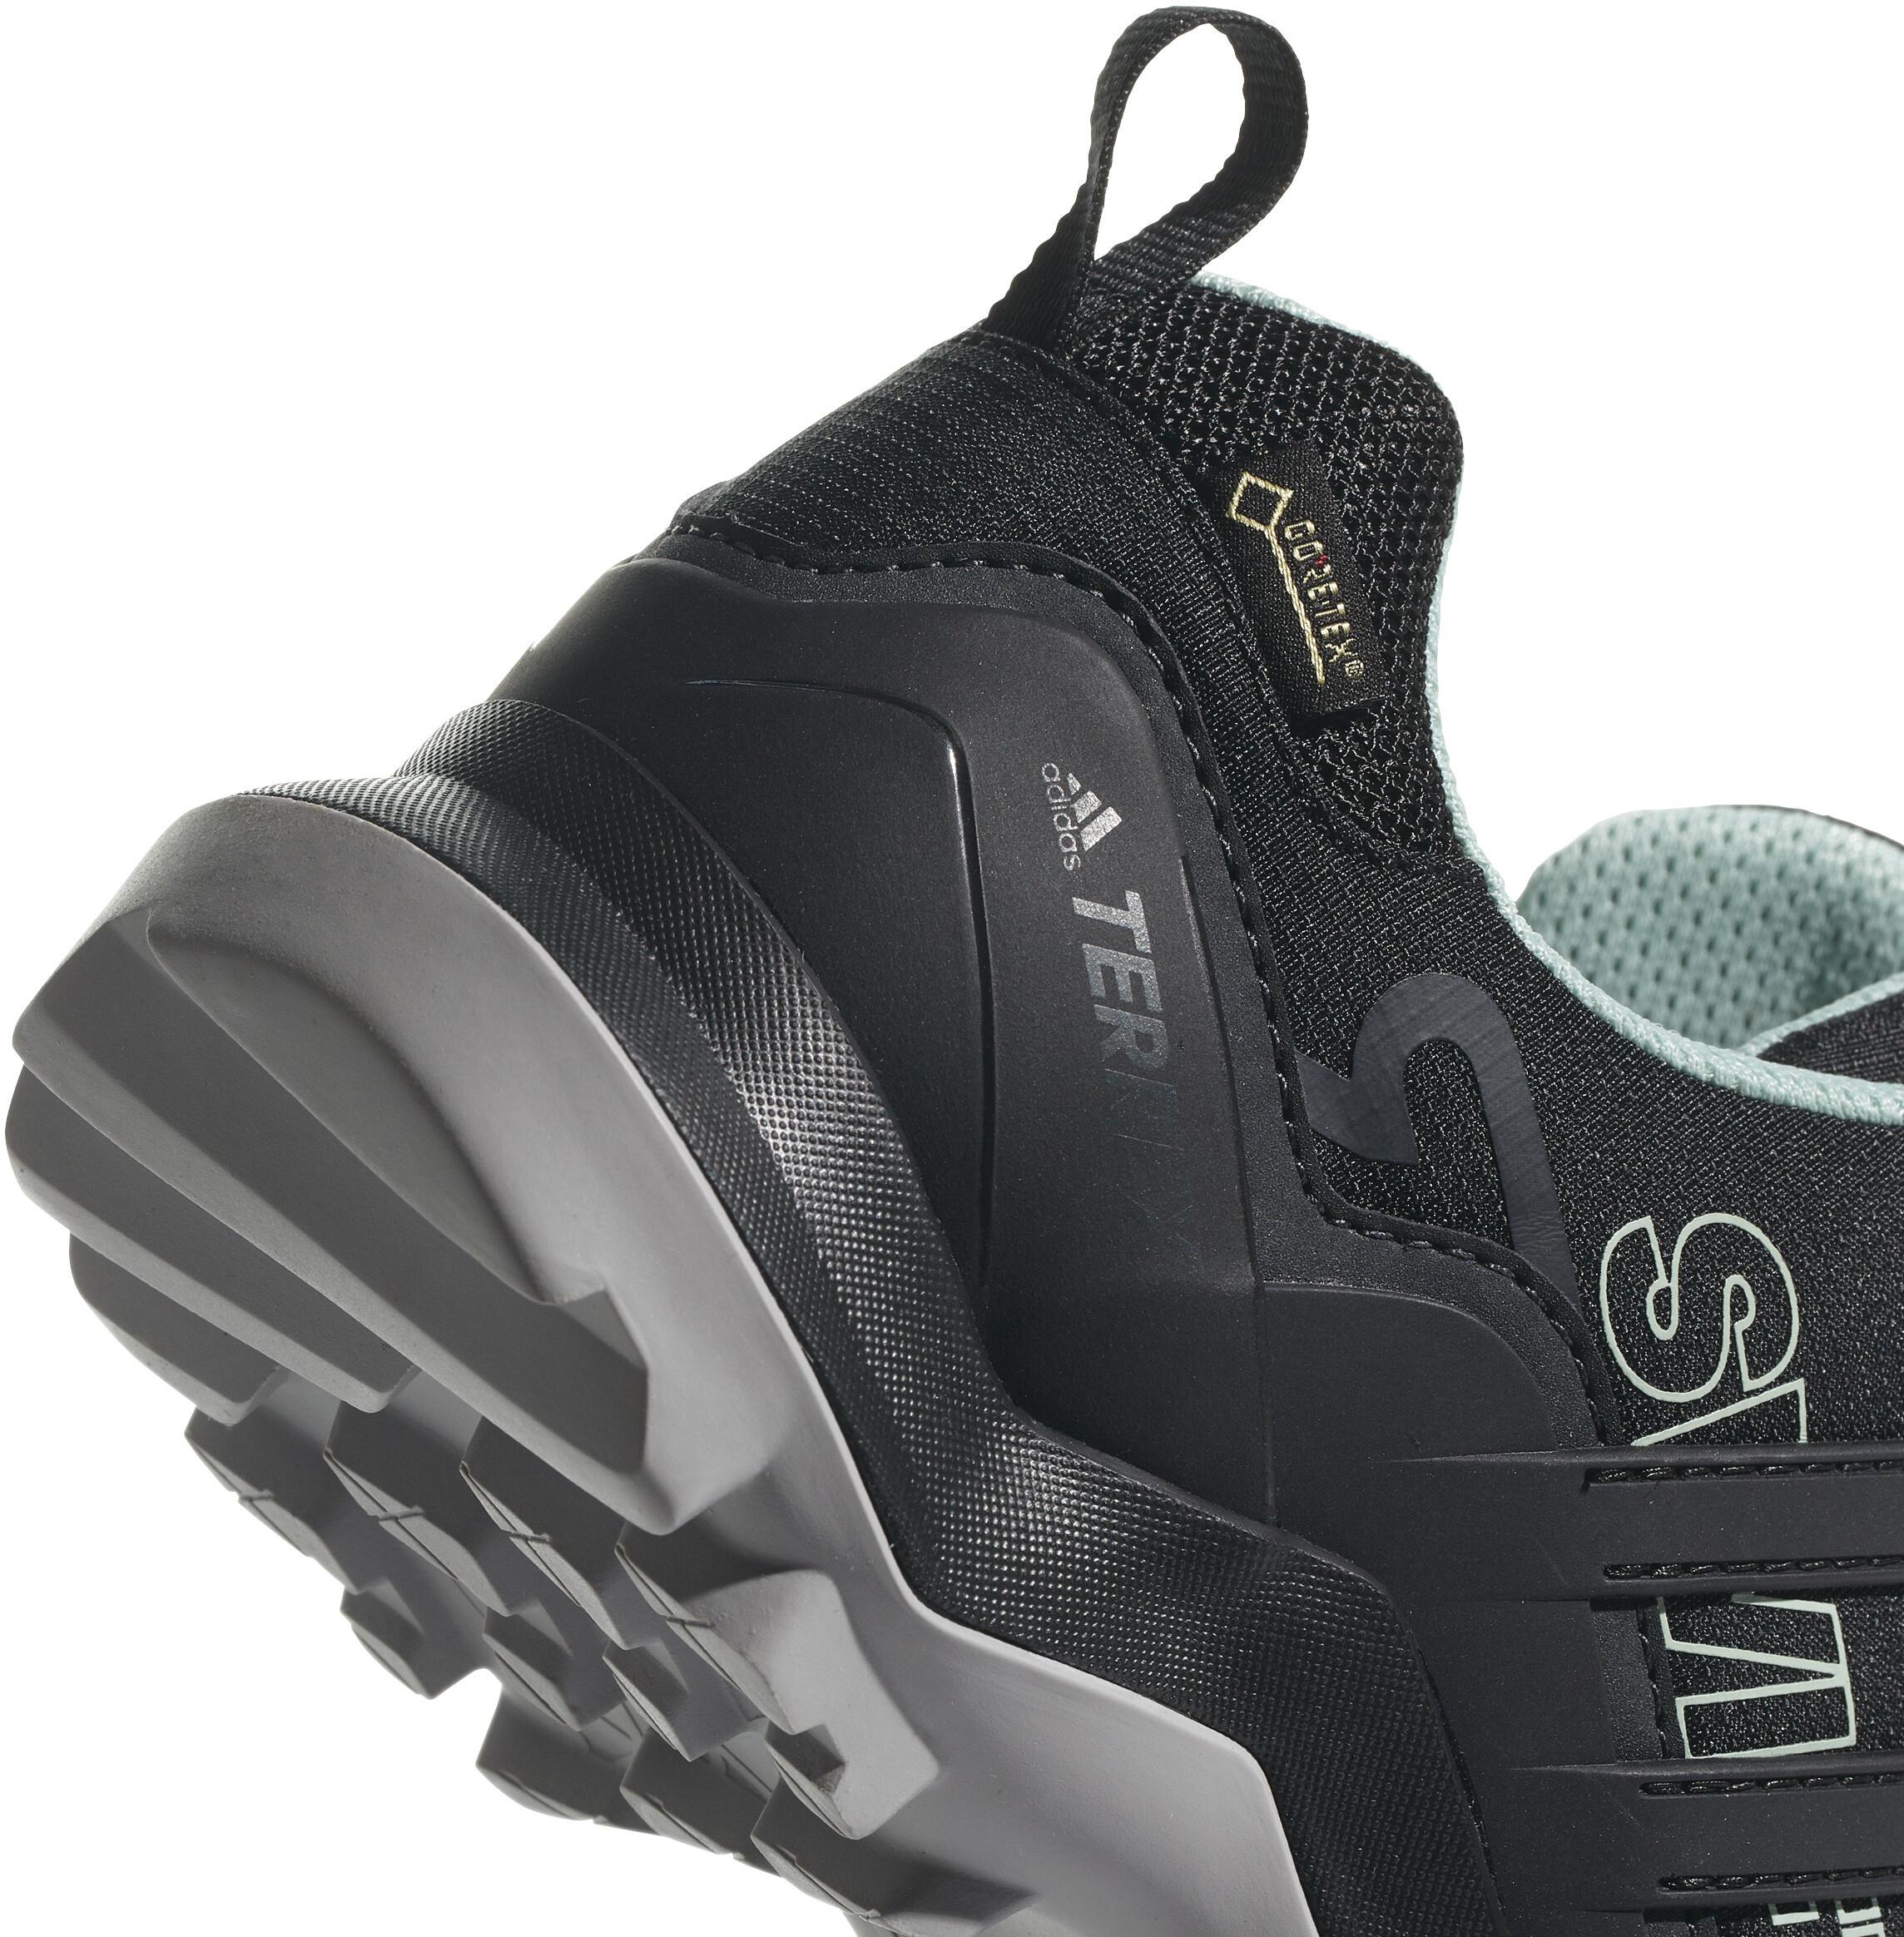 7e7229b81223c adidas TERREX Swift R2 GTX - Calzado Mujer - negro